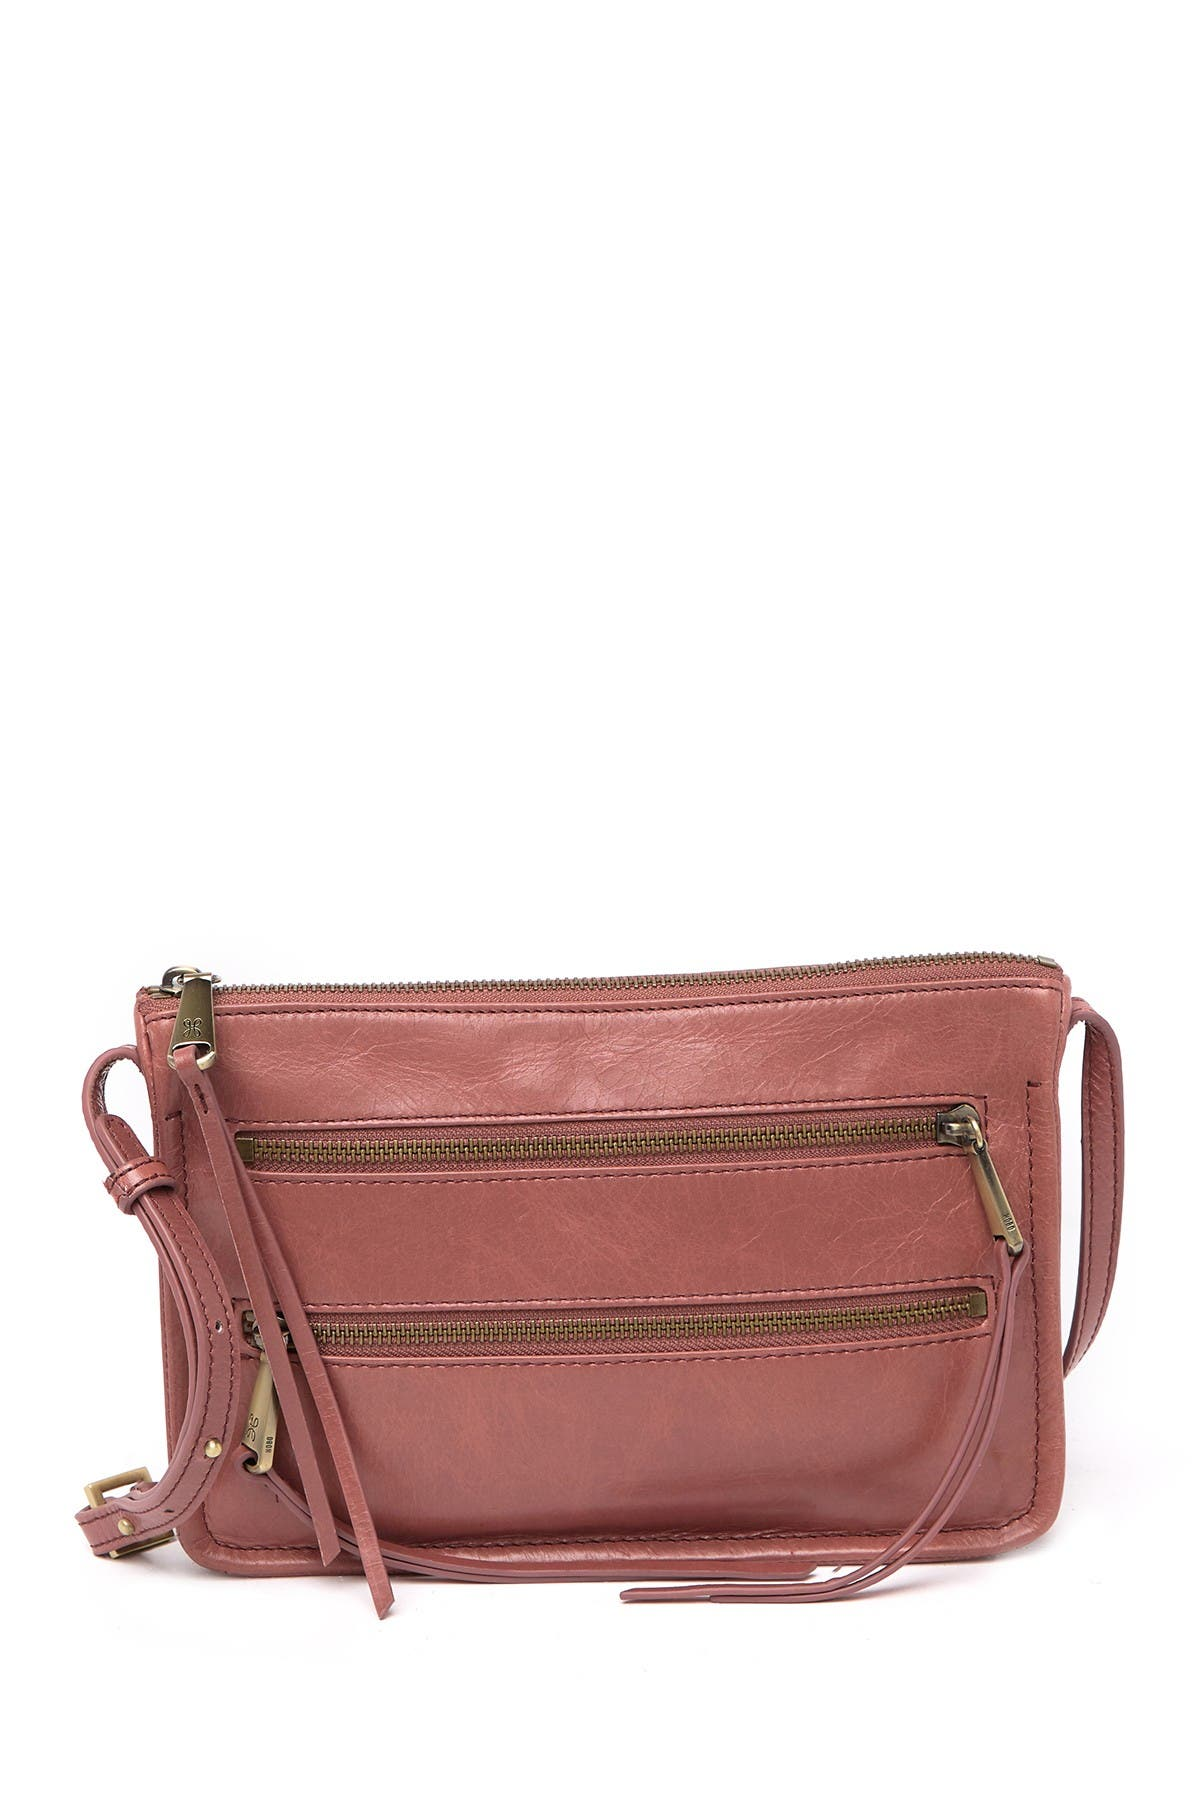 Image of Hobo Mission Leather Crossbody Bag